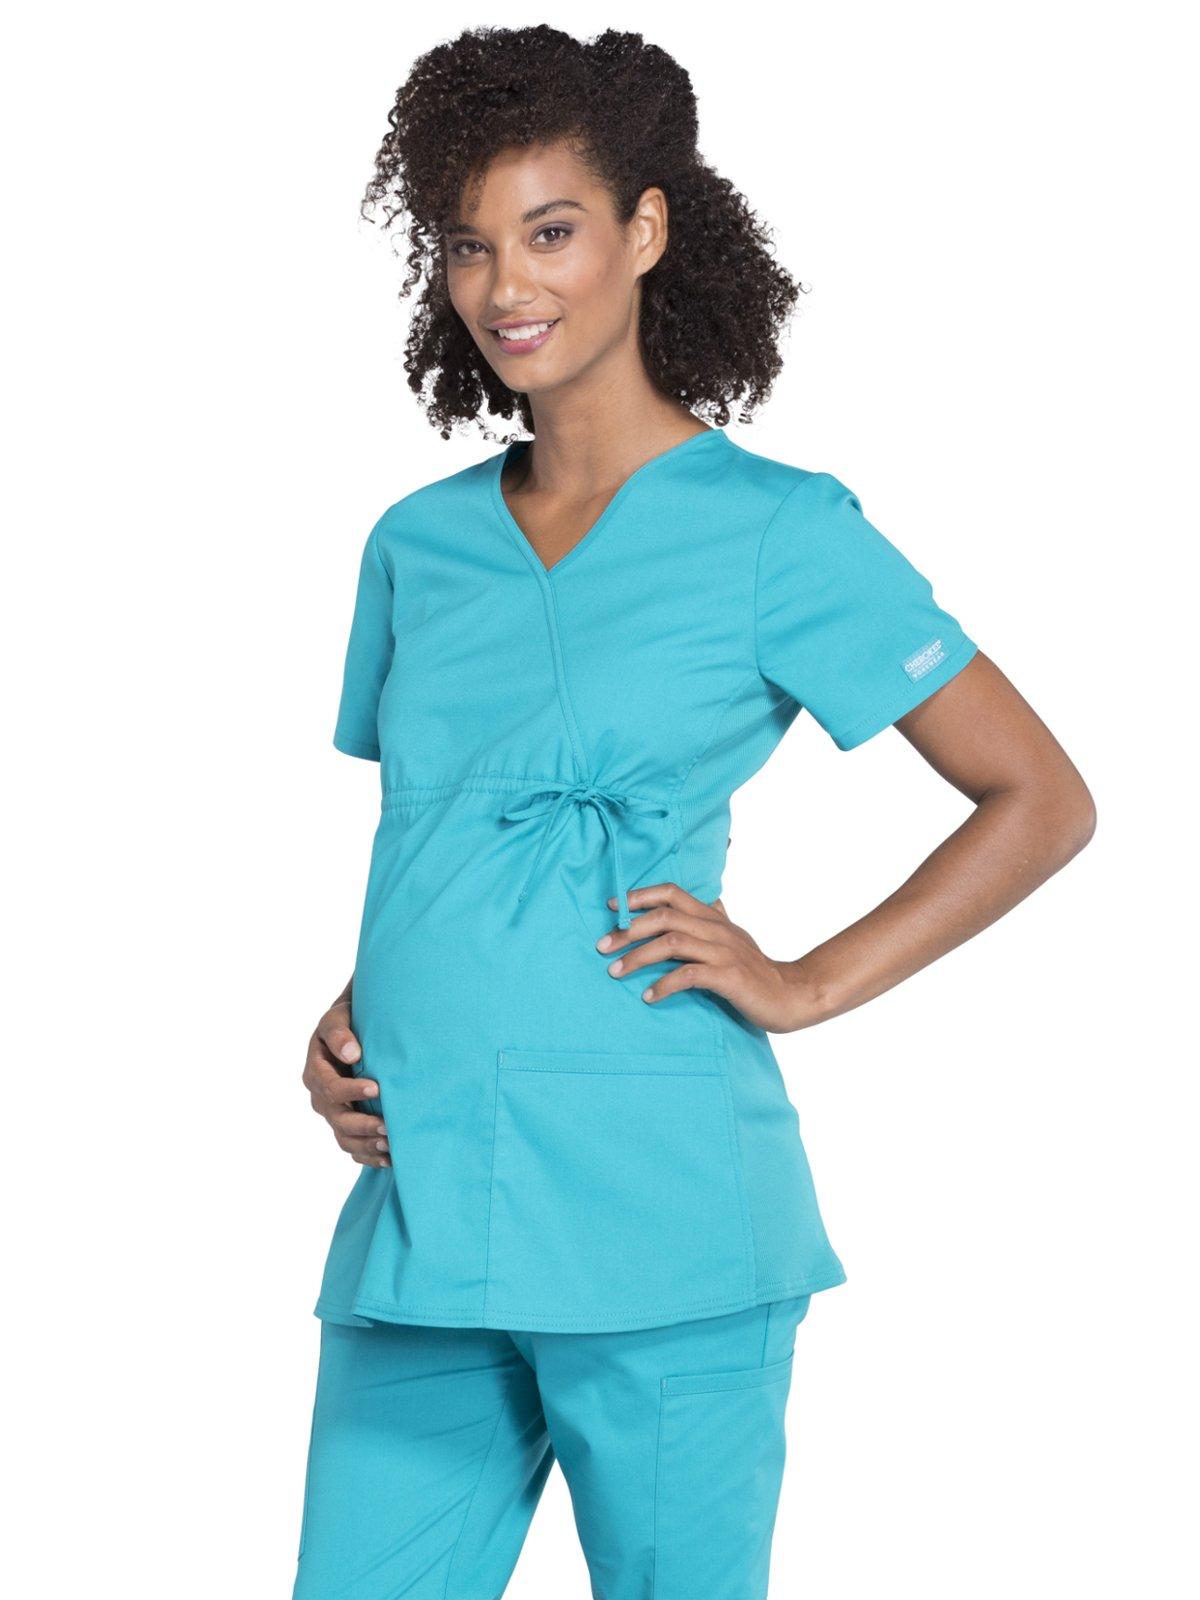 Cherokee Professionals Workwear Women's Maternity Mock Wrap Soft Knit Panel Solid Scrub Top Medium Teal Blue